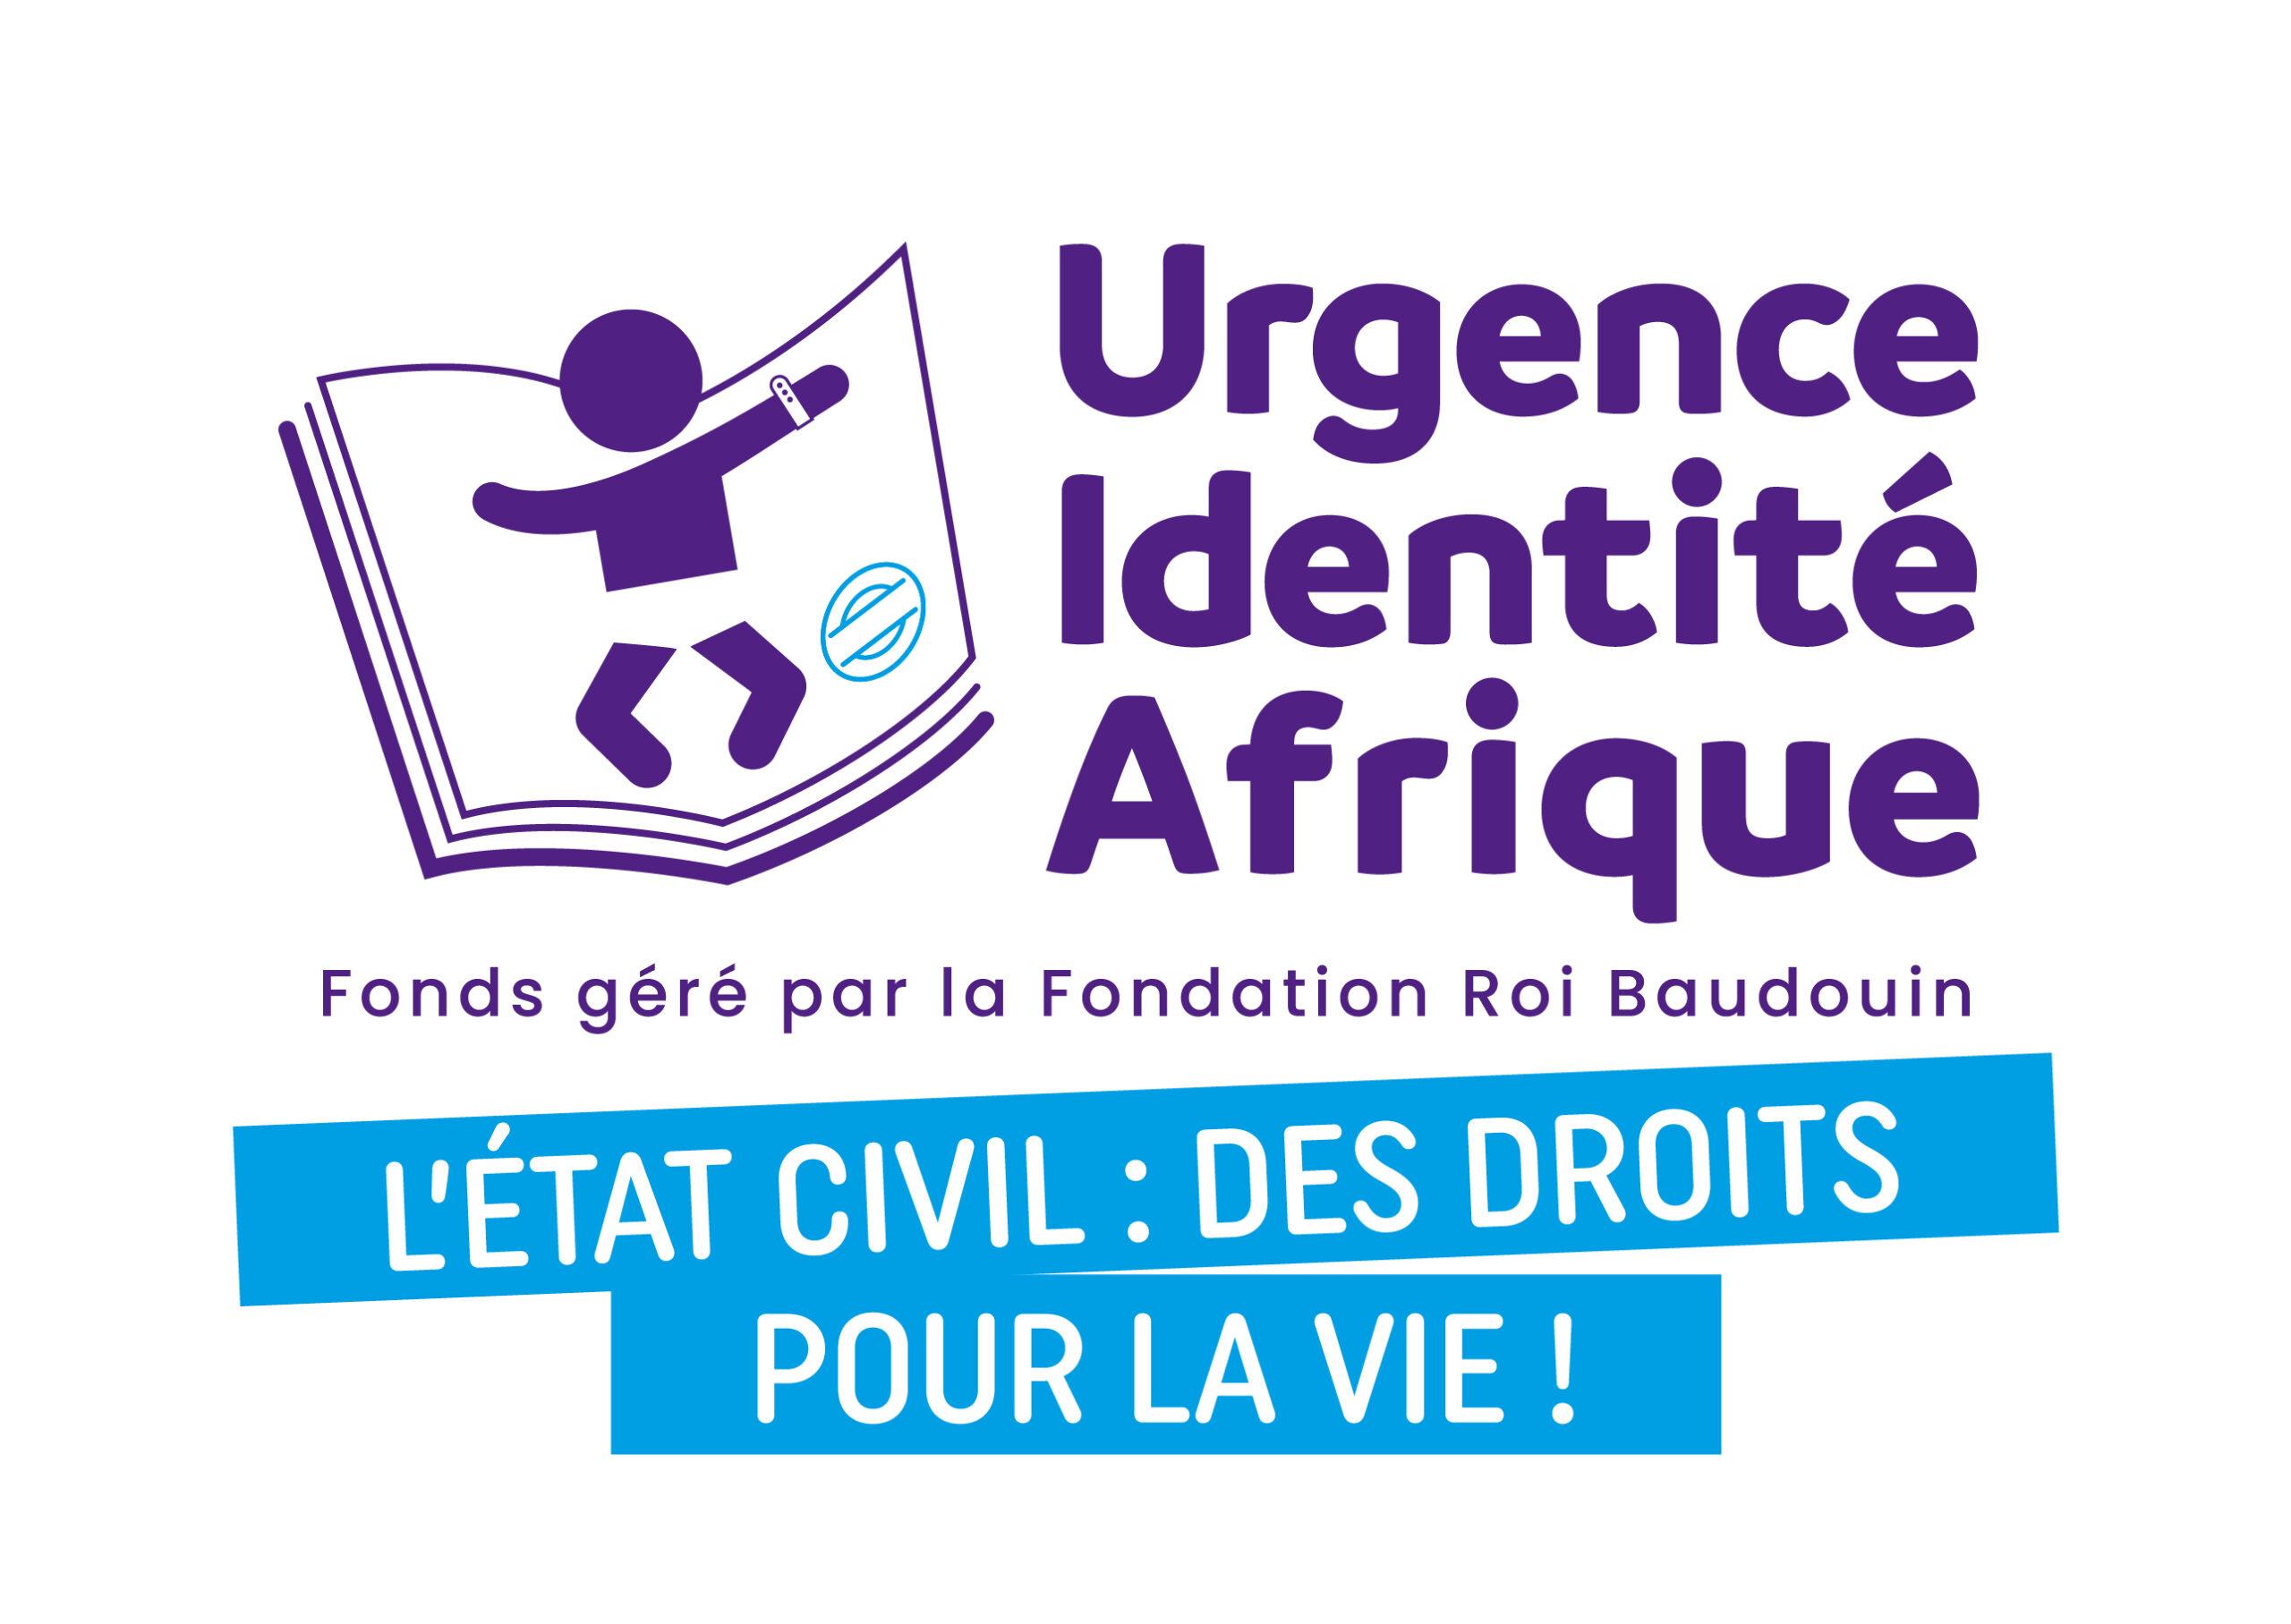 UIAFRICA - Urgence Identité Afrique